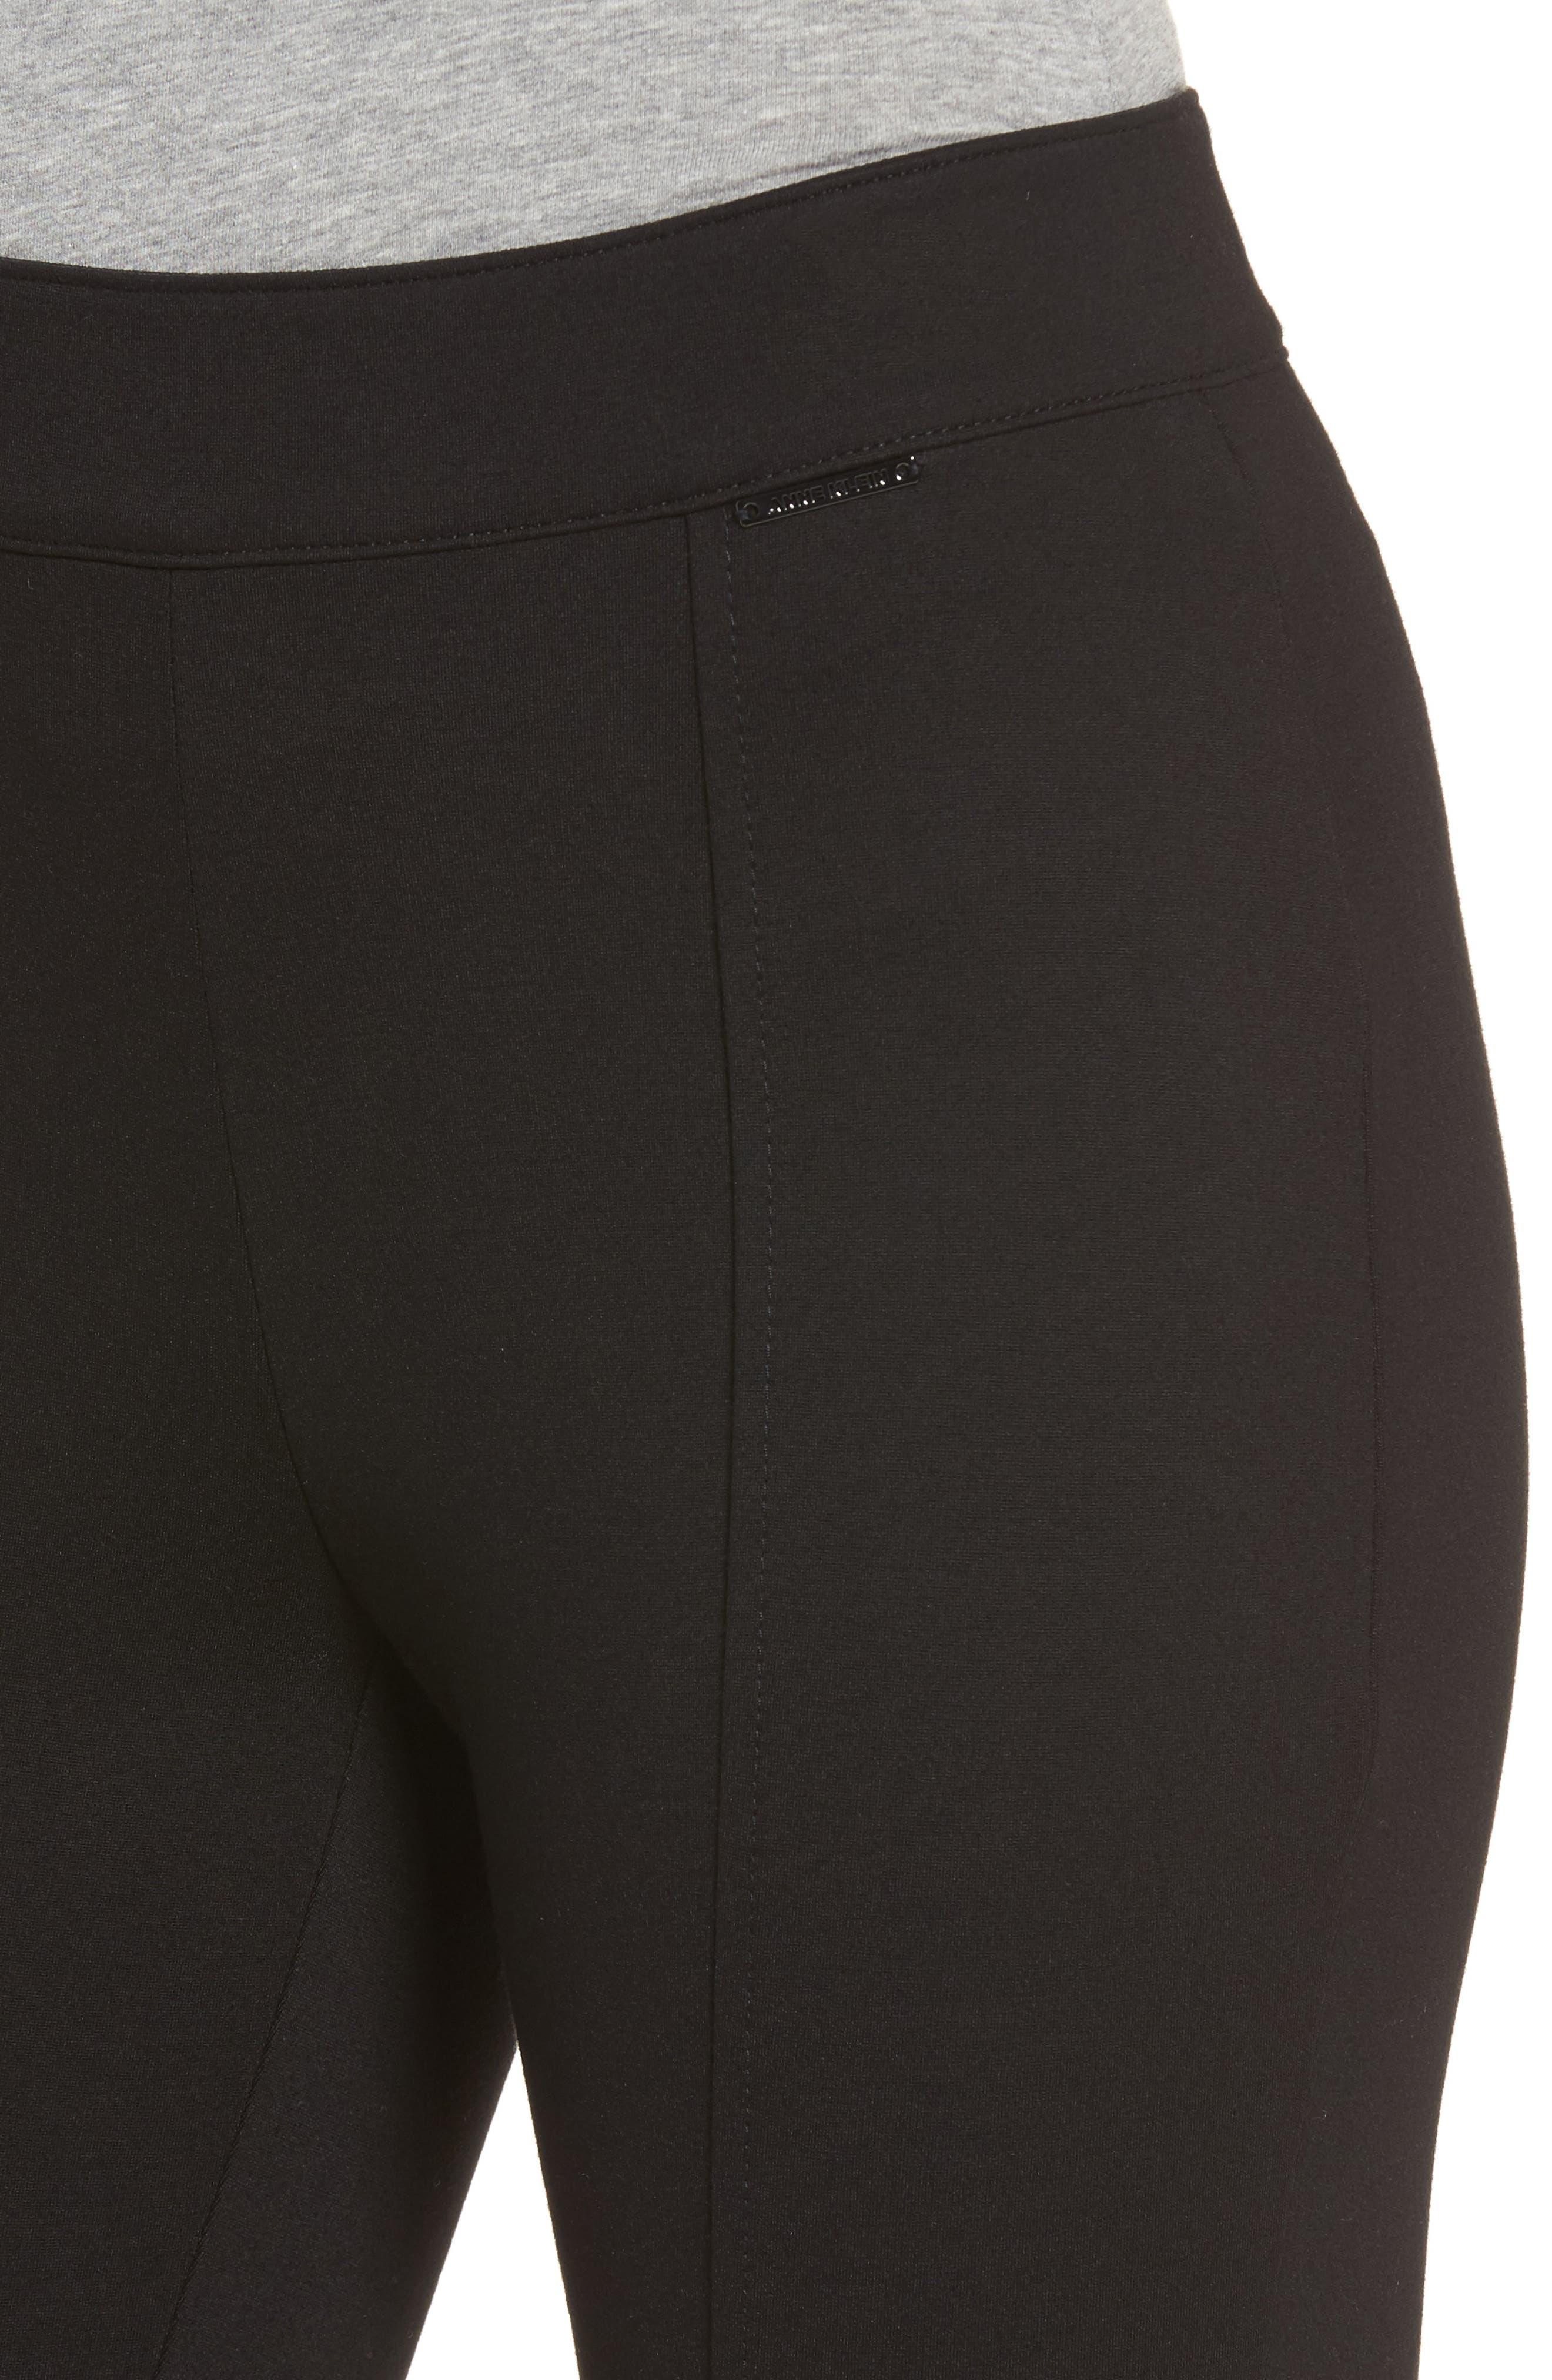 Compression Slim Leg Pants,                             Alternate thumbnail 4, color,                             Black